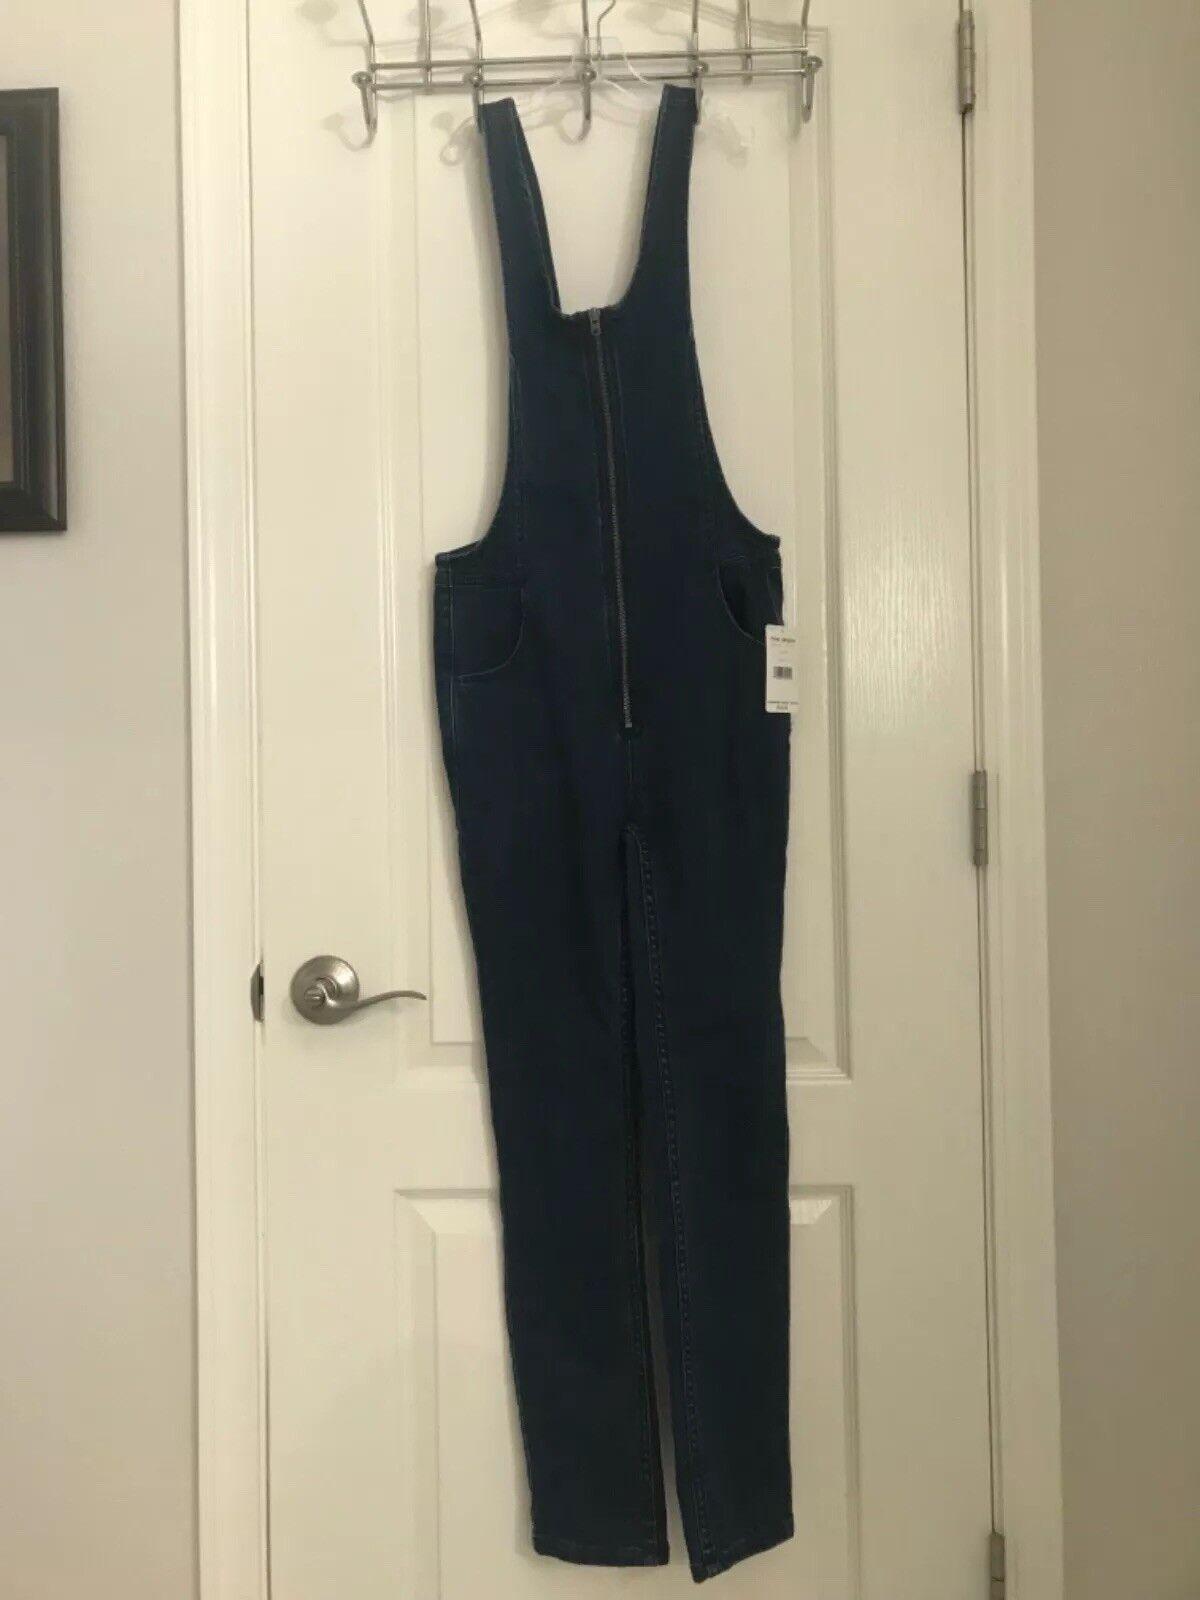 Free People Jax bluee Denim jumpsuit 2 XS S